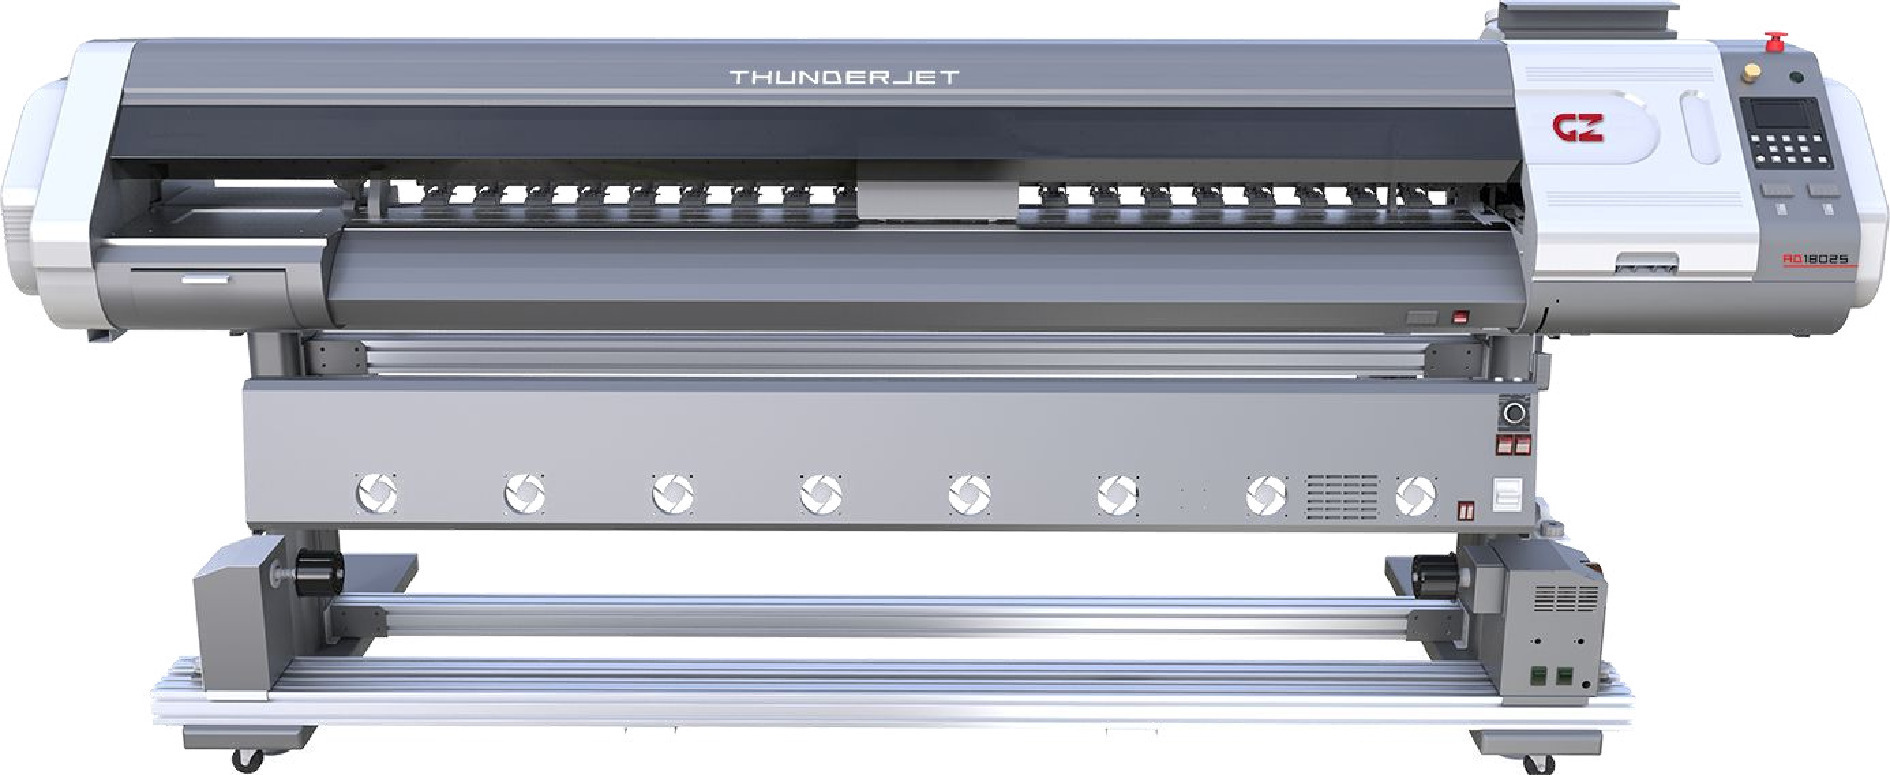 Thunderjet AD1802S